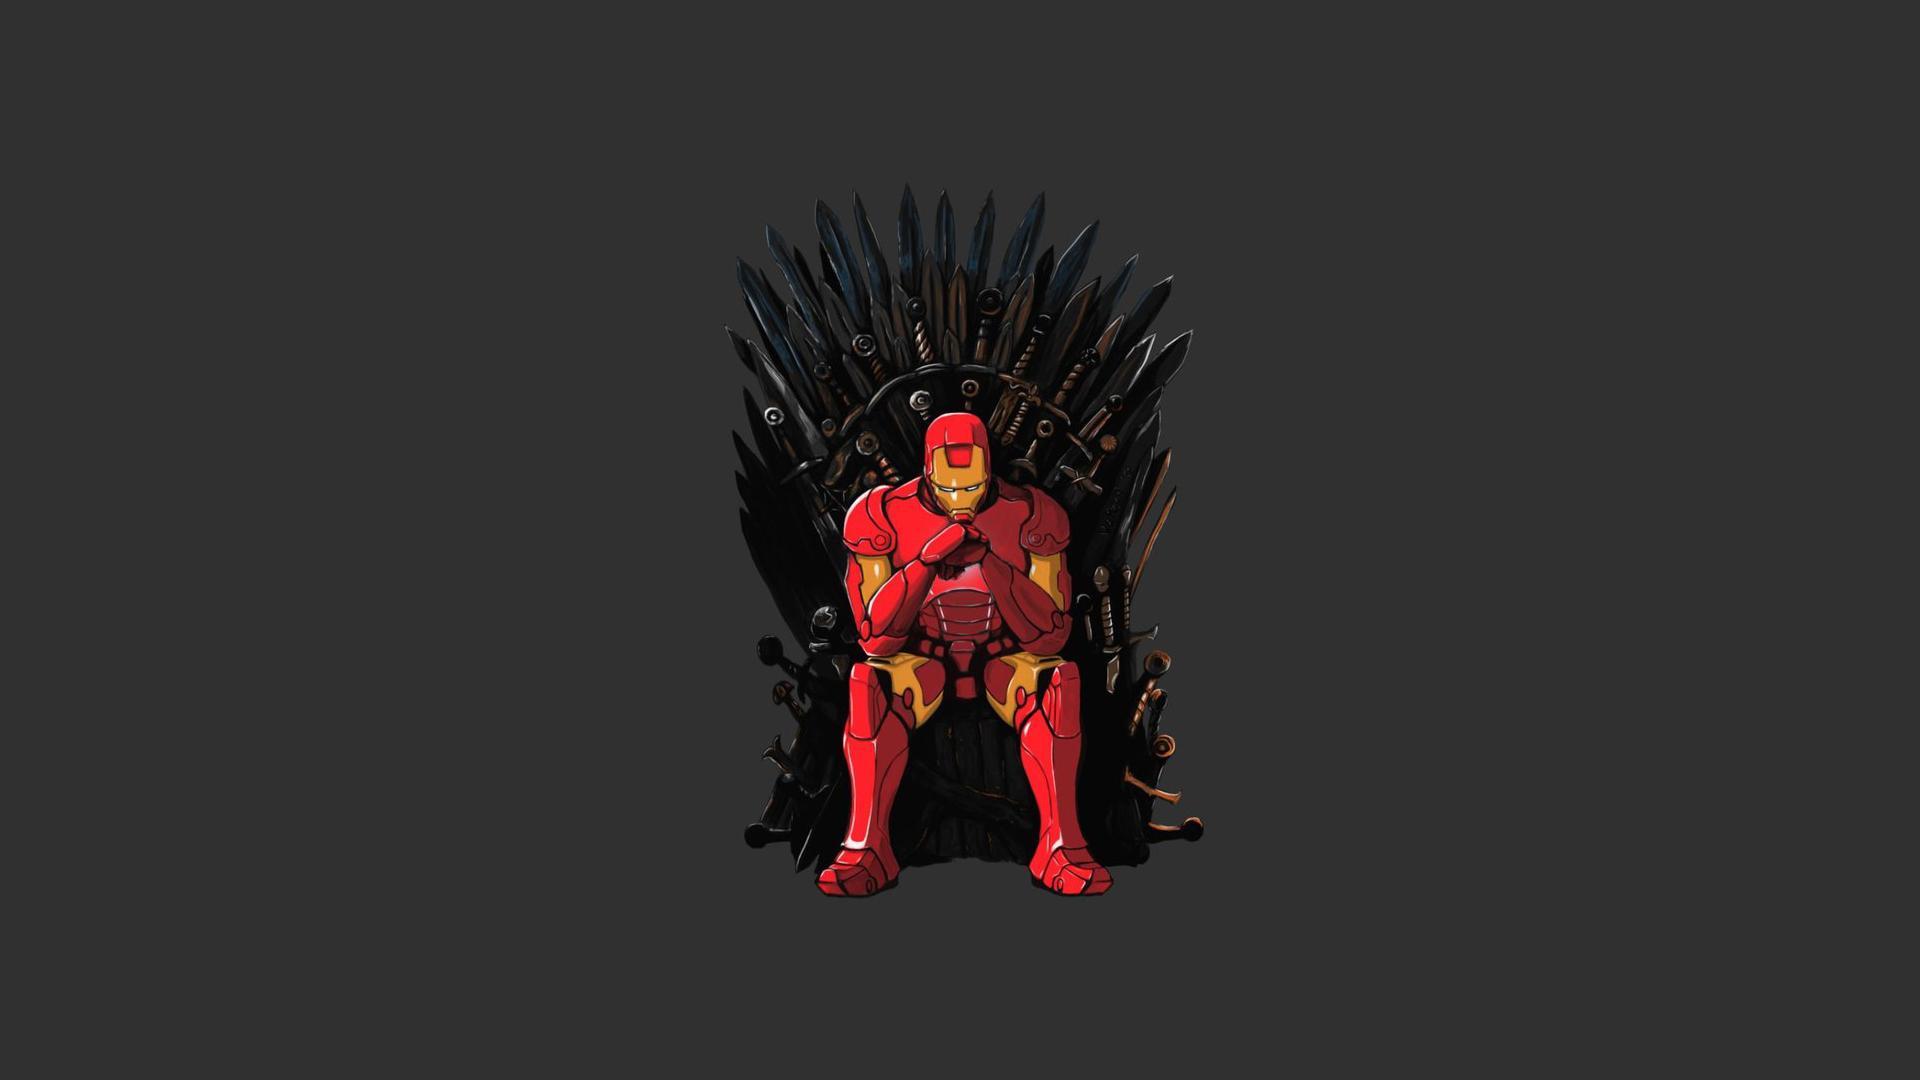 Iron Man Comic Wallpapers Full HD - Wickedsa com